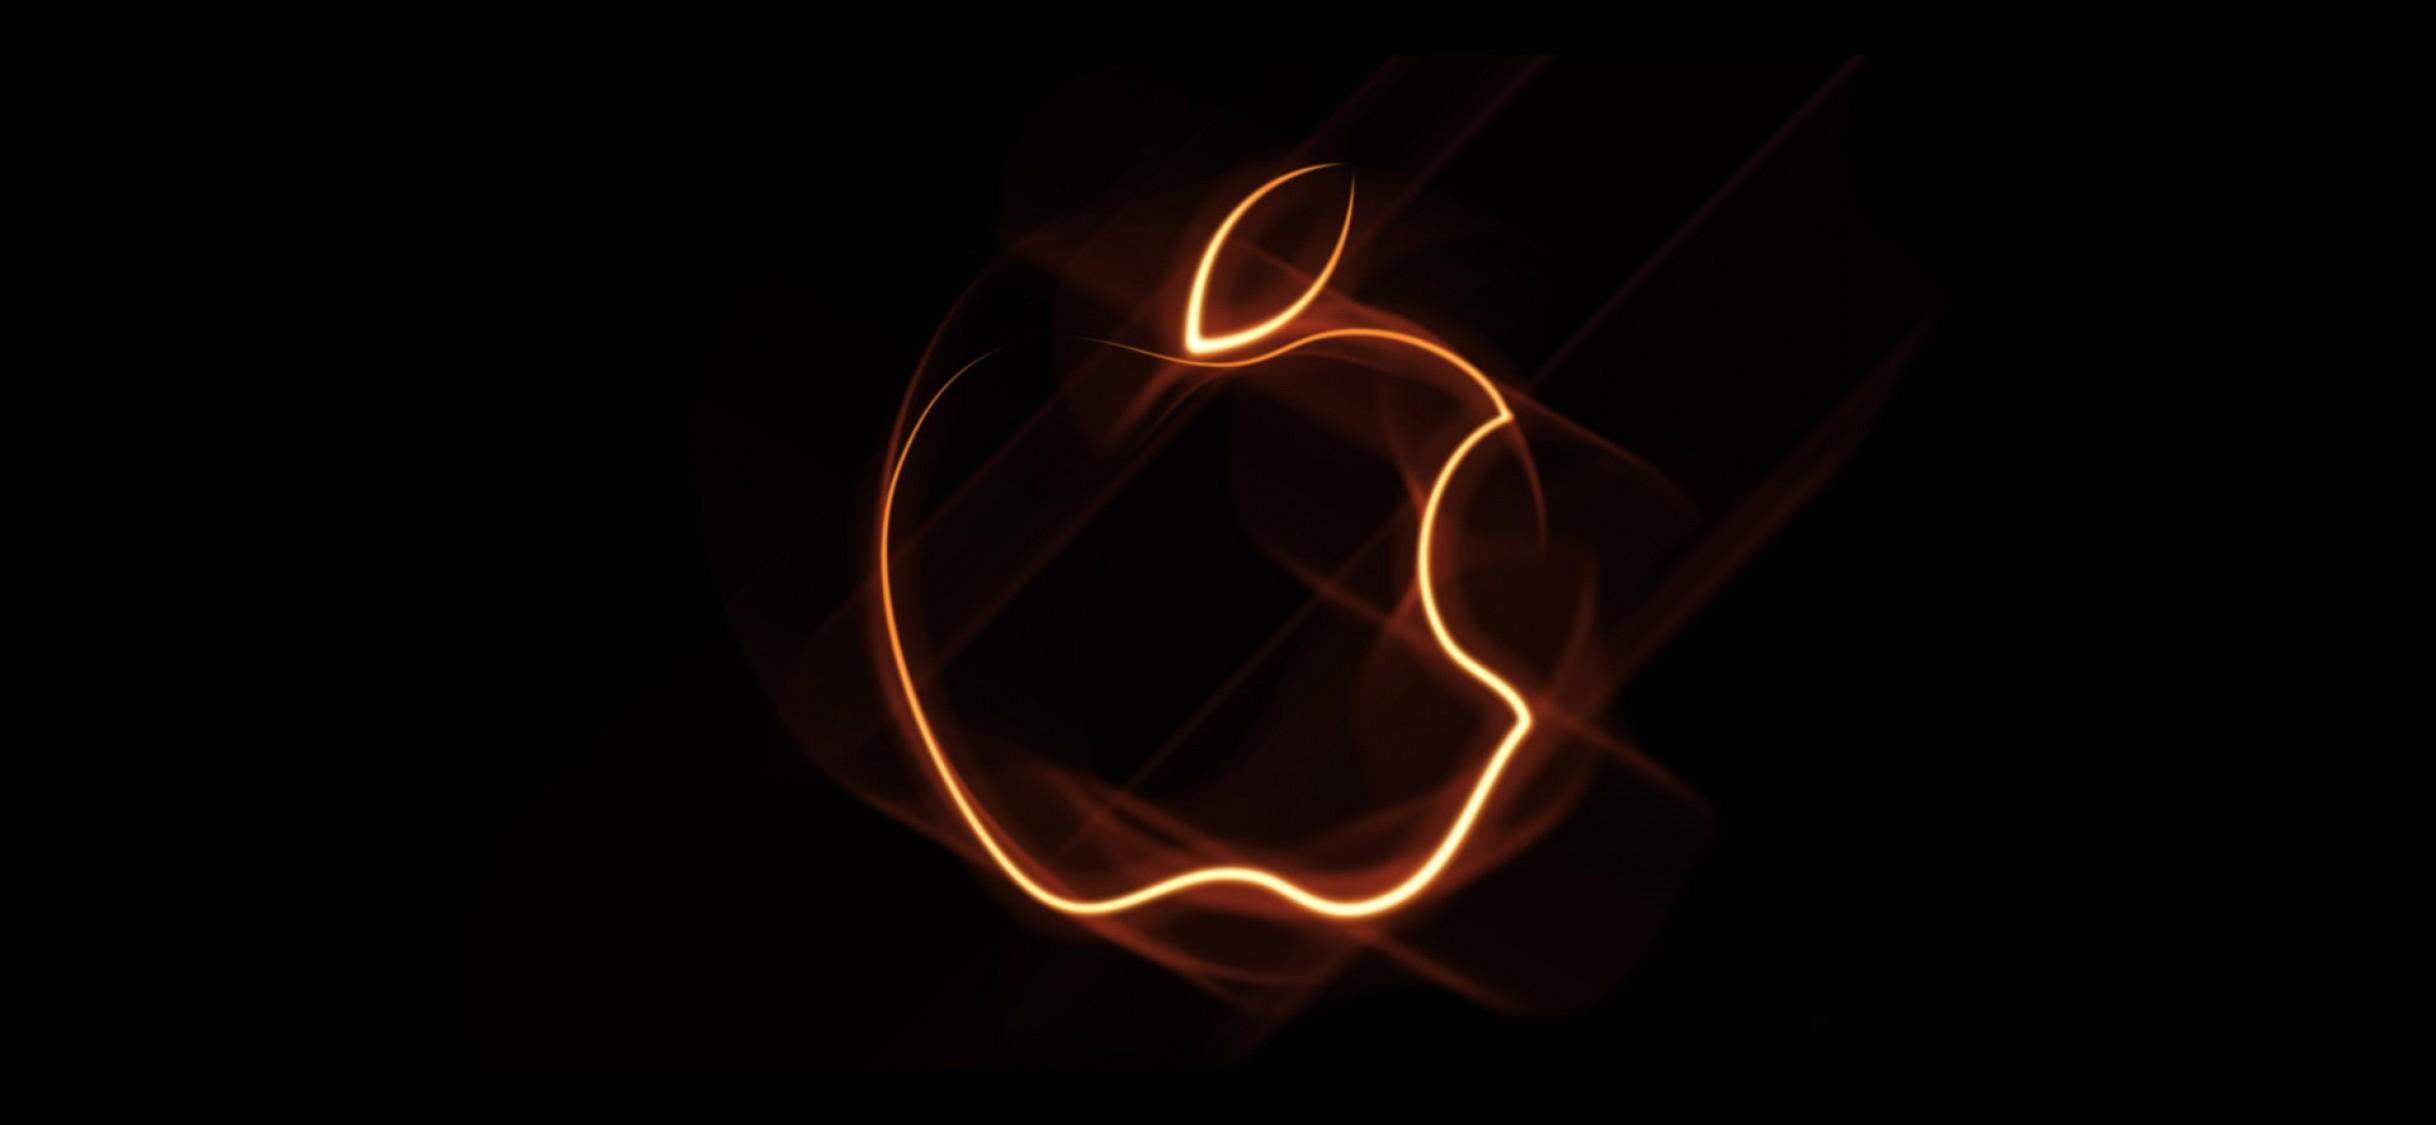 Orange Outline Apple Logo Wallpaper For Desktop And